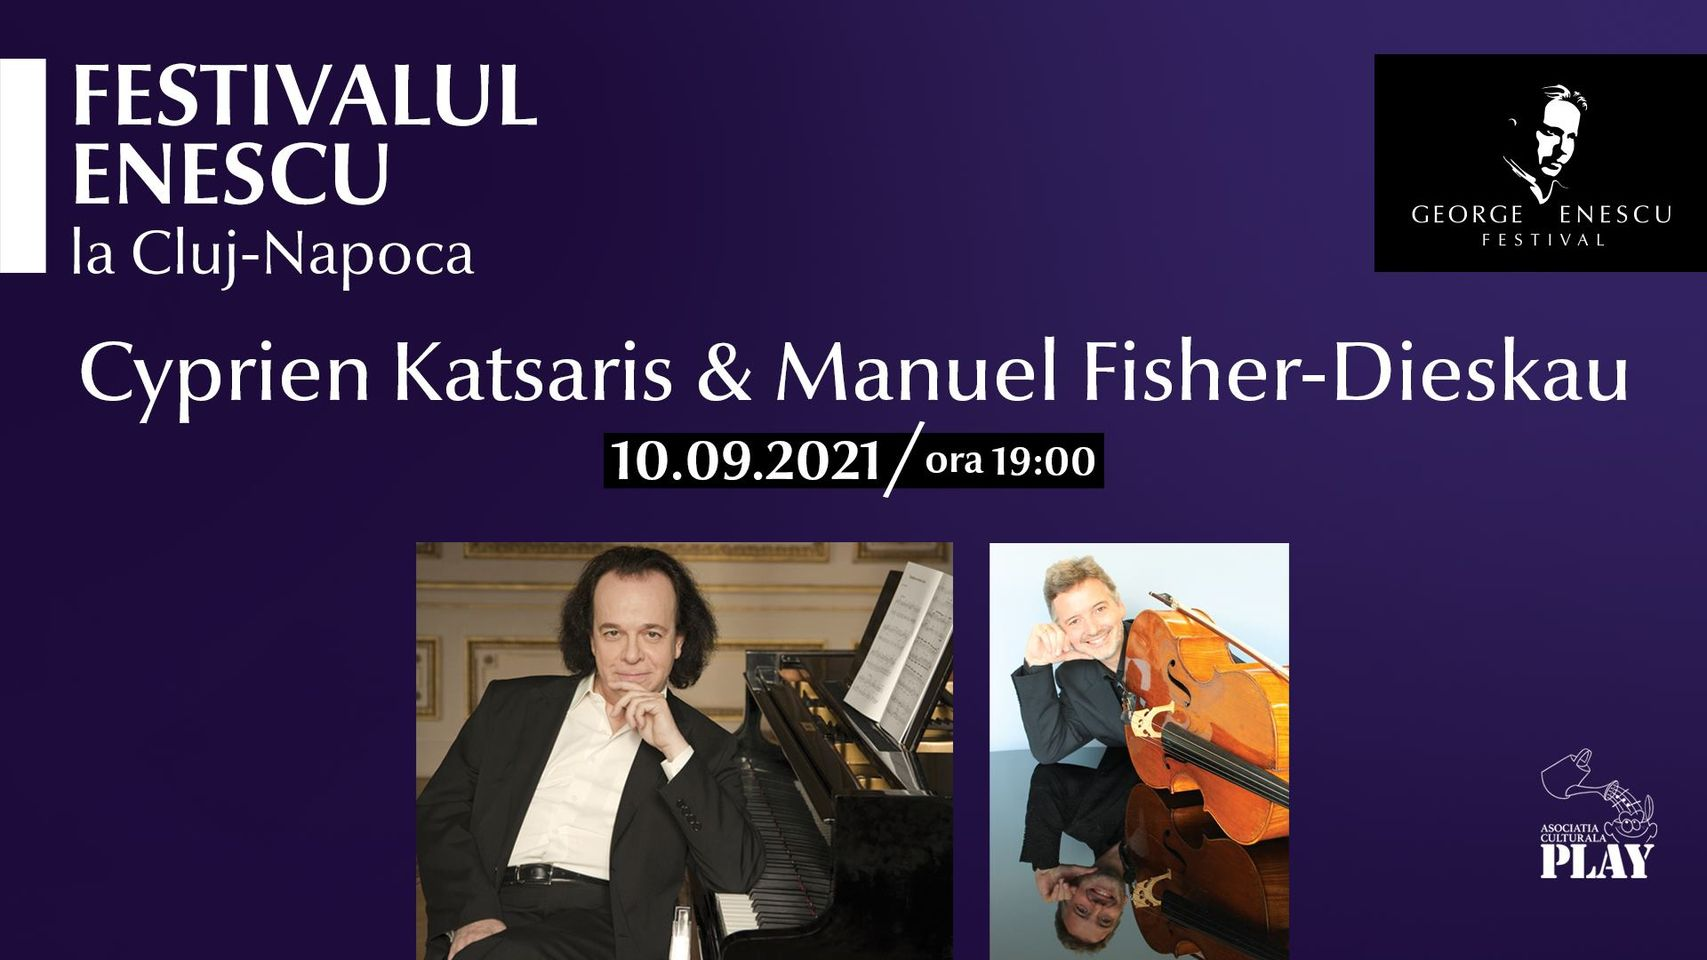 Recital Cyprien Katsaris & Manuel Fisher-Dieskau ✦ Festivalul Enescu la Cluj-Napoca